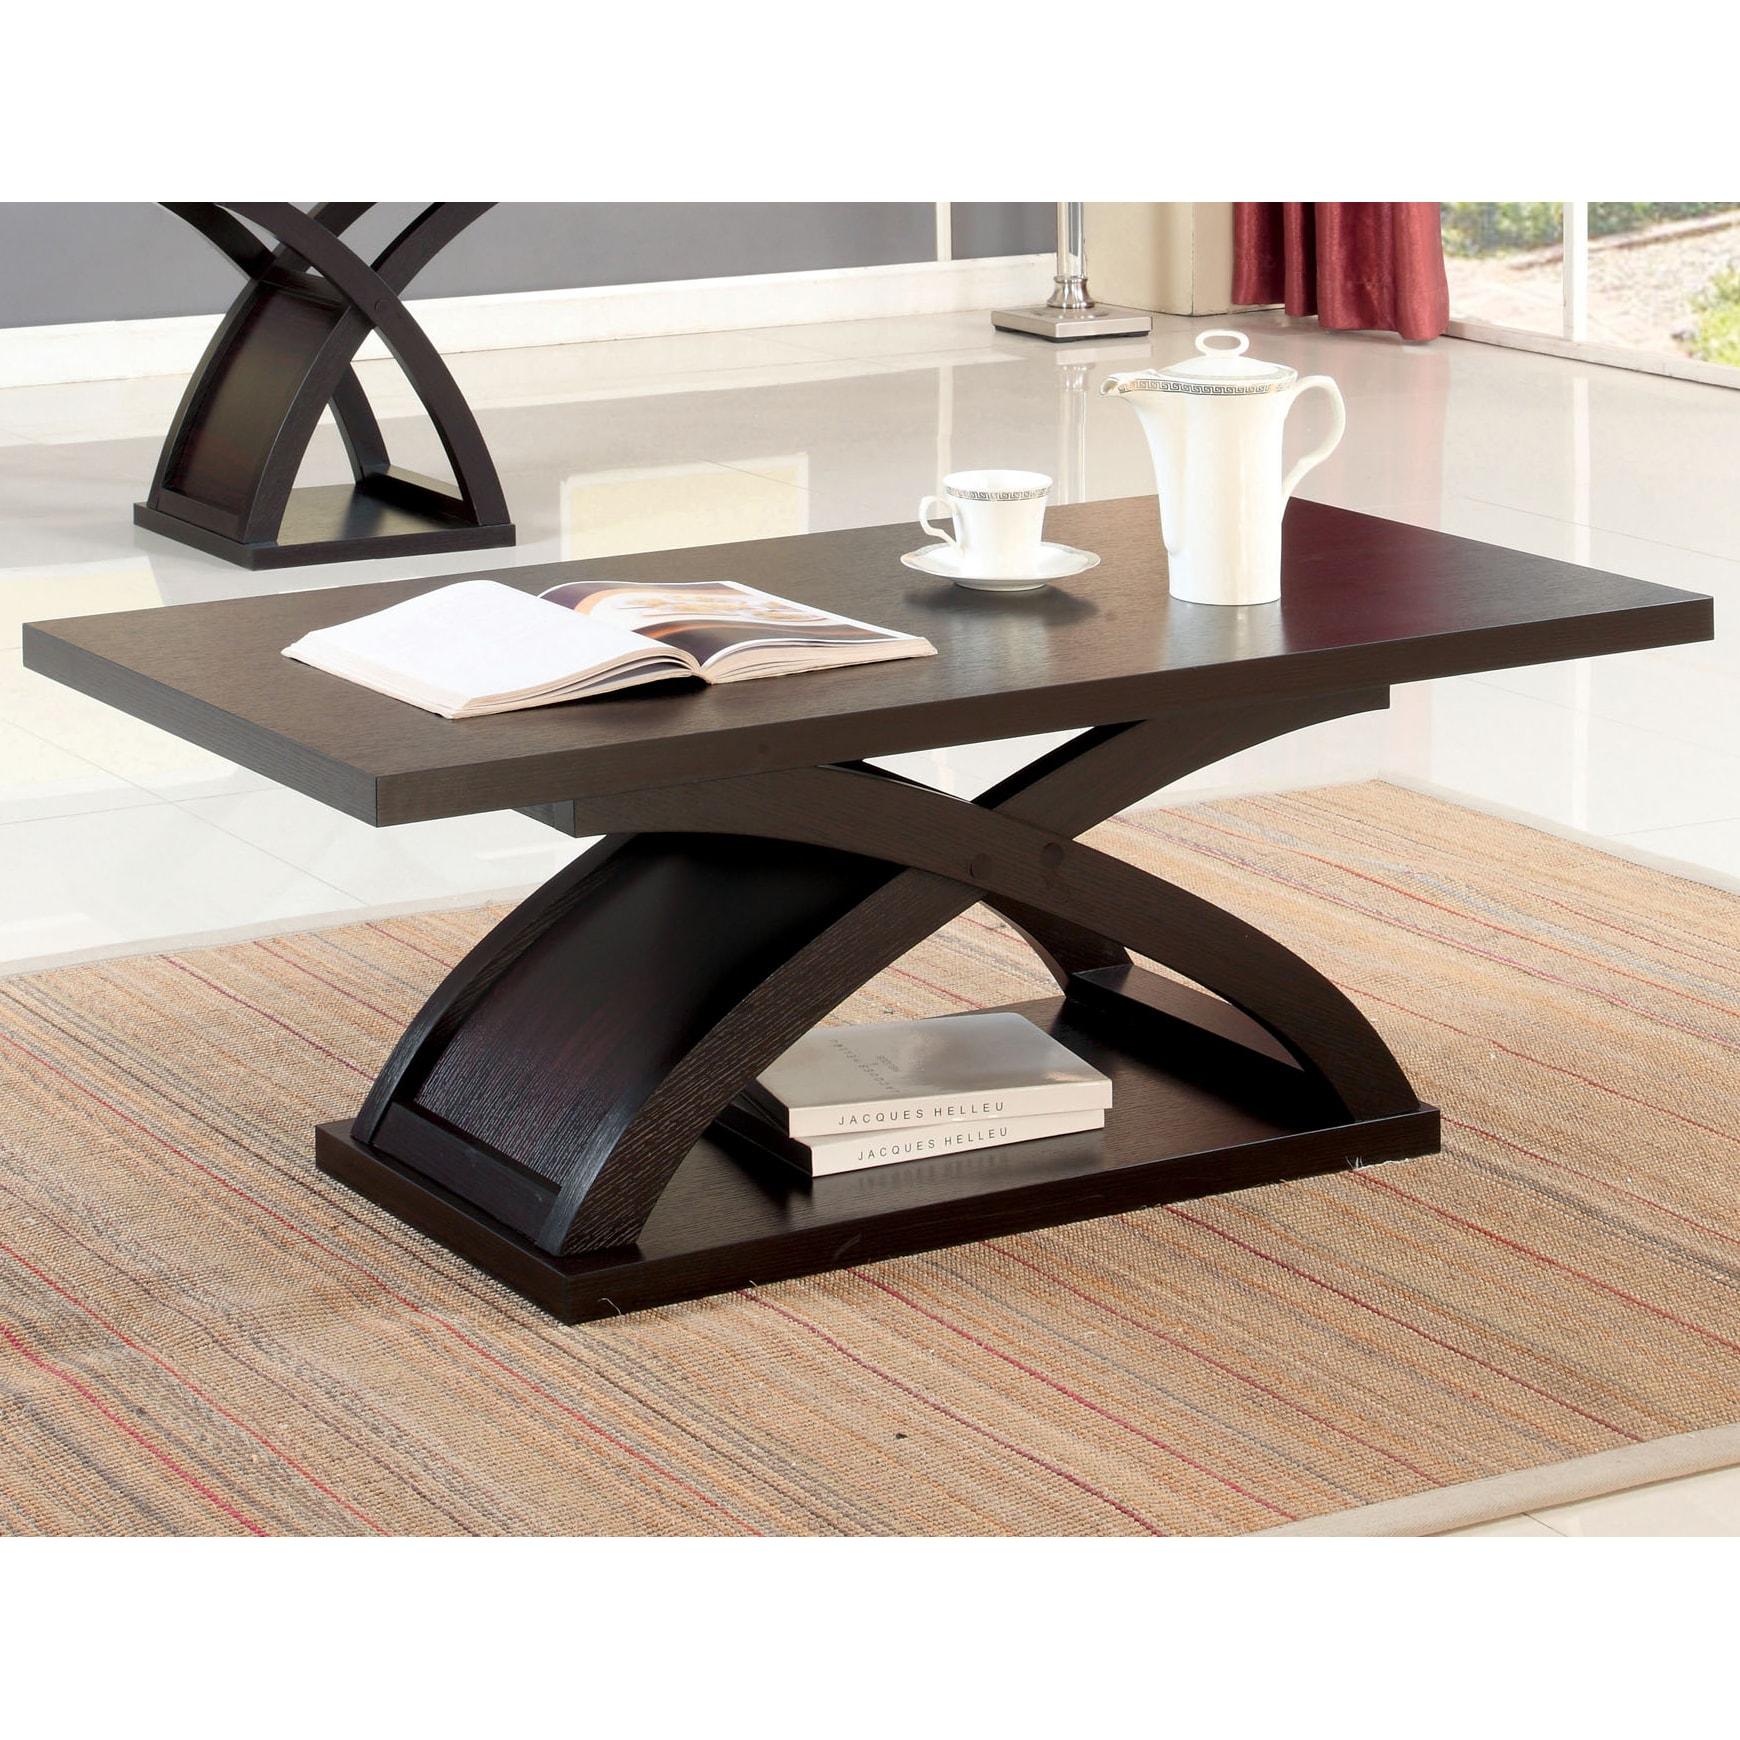 Barkley Console Table: Mid-Century Coffee, Sofa & End Tables